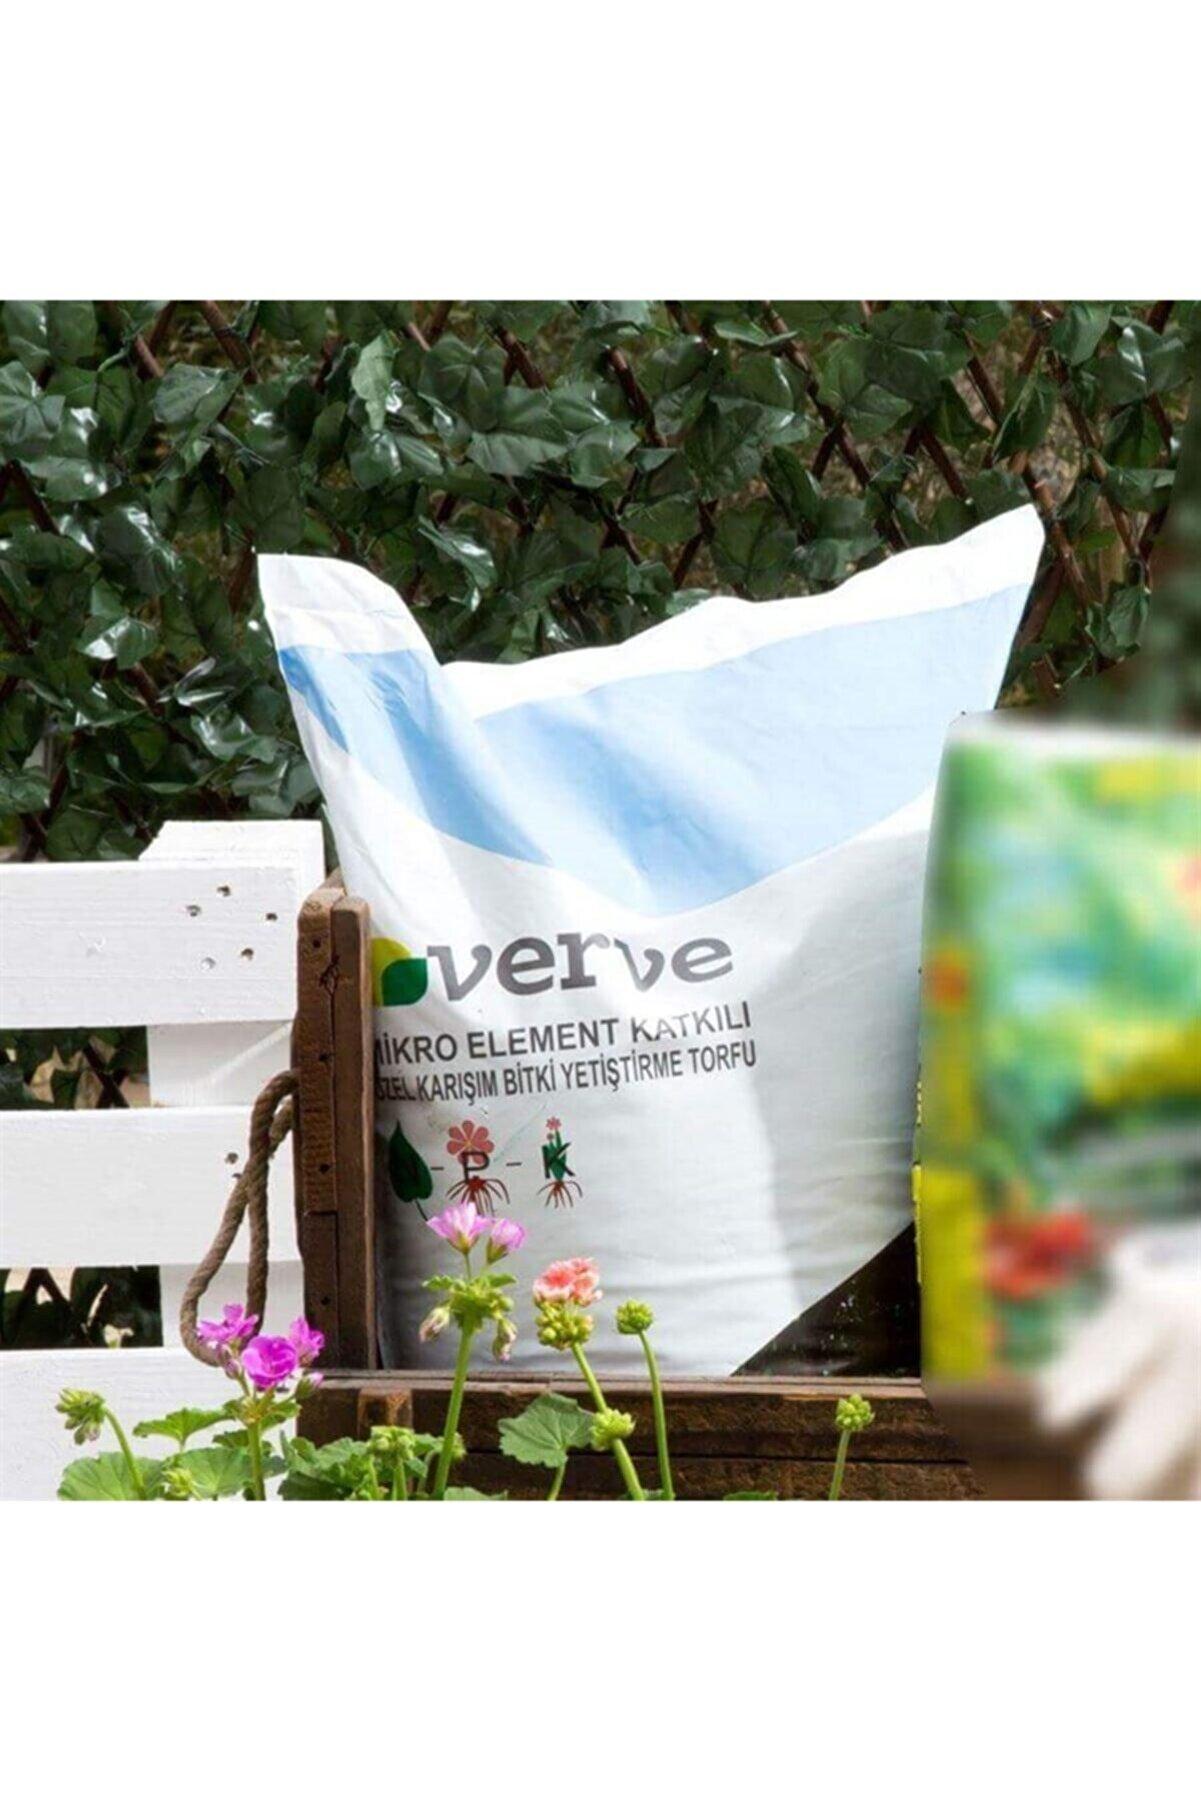 Verve Verve Mikro Element Katkılı Torf Toprak 5 Litre